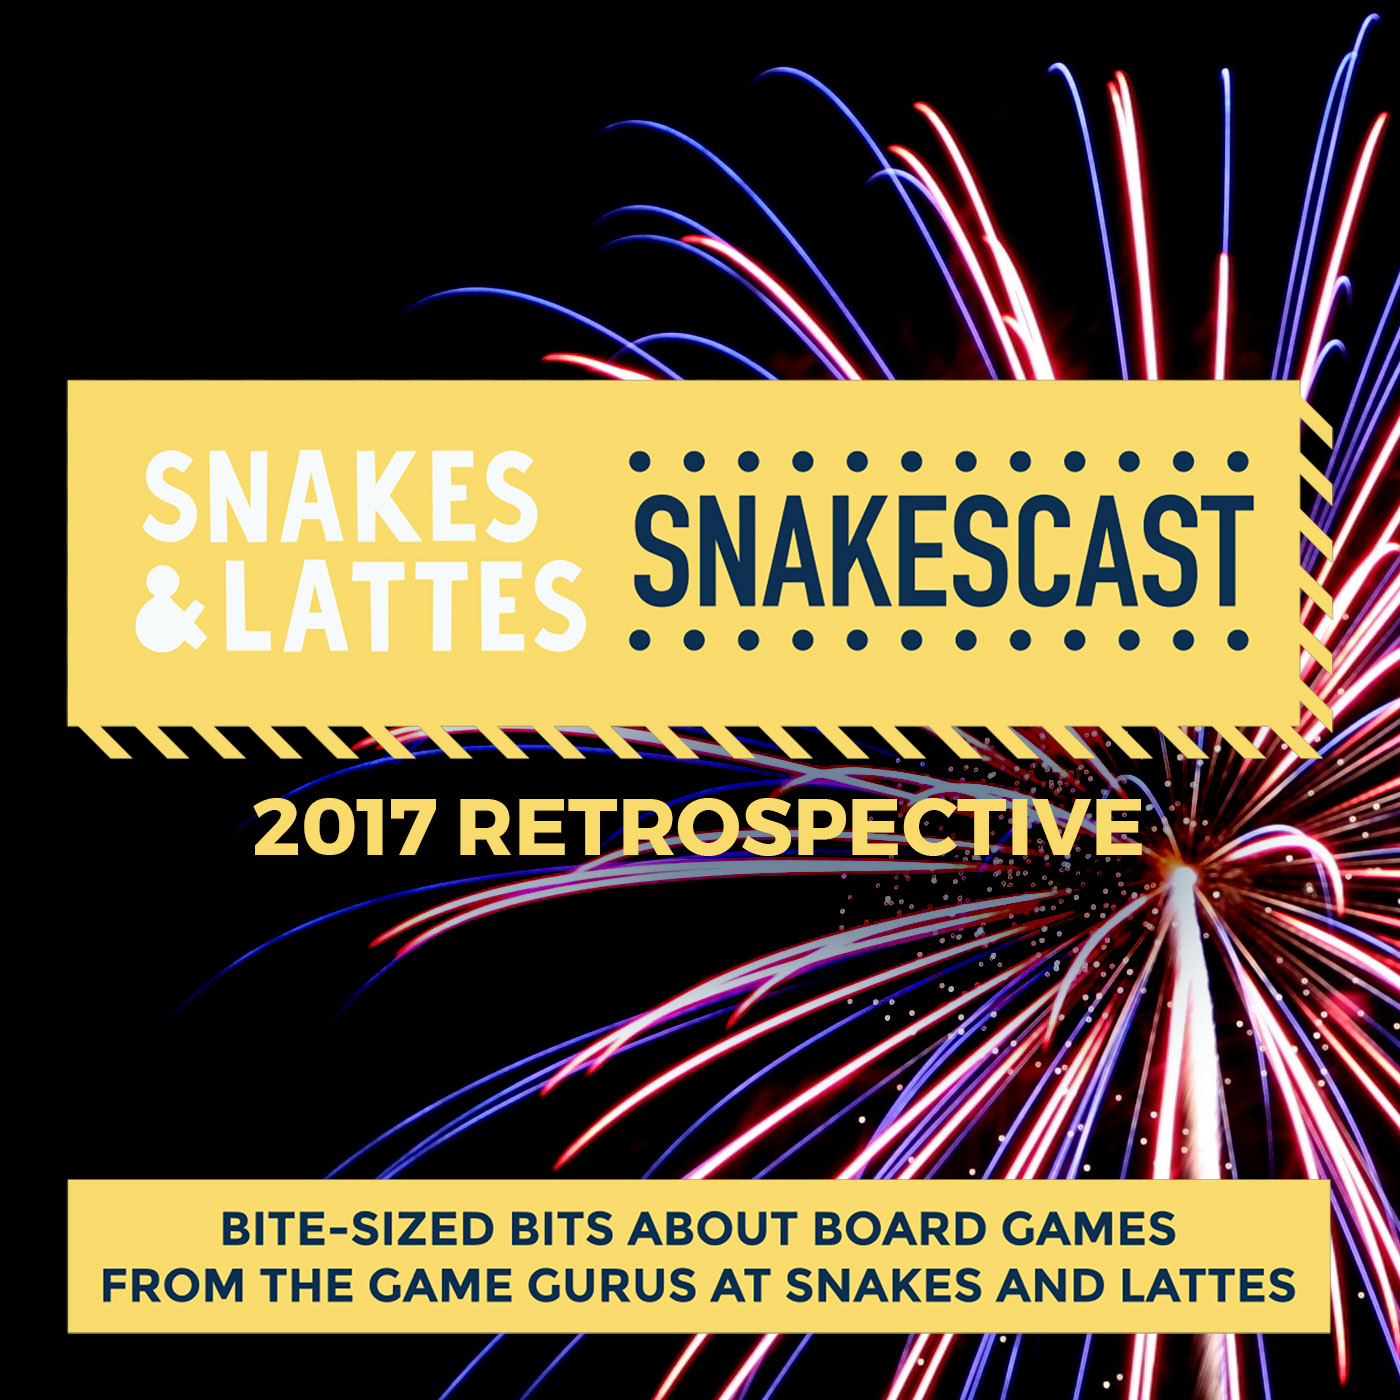 2017 Retrospective, Part 3 - Bringing out the big guns